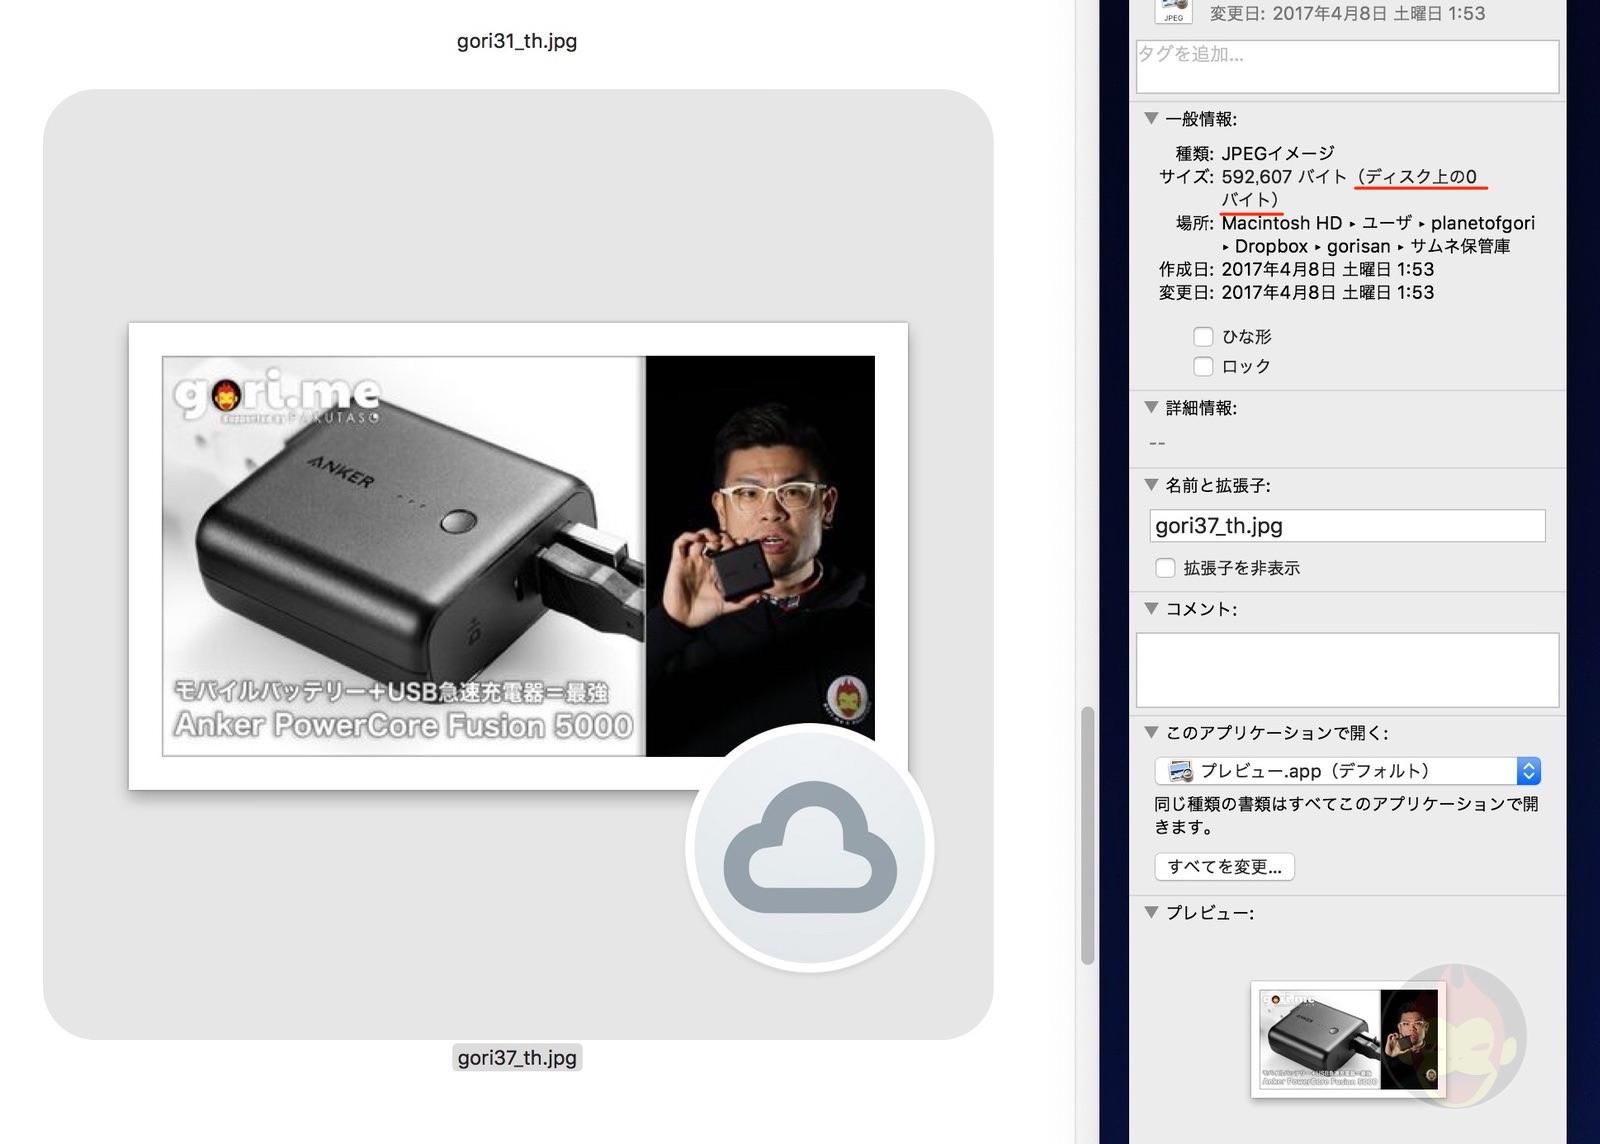 Dropbox SmartSync 02 2